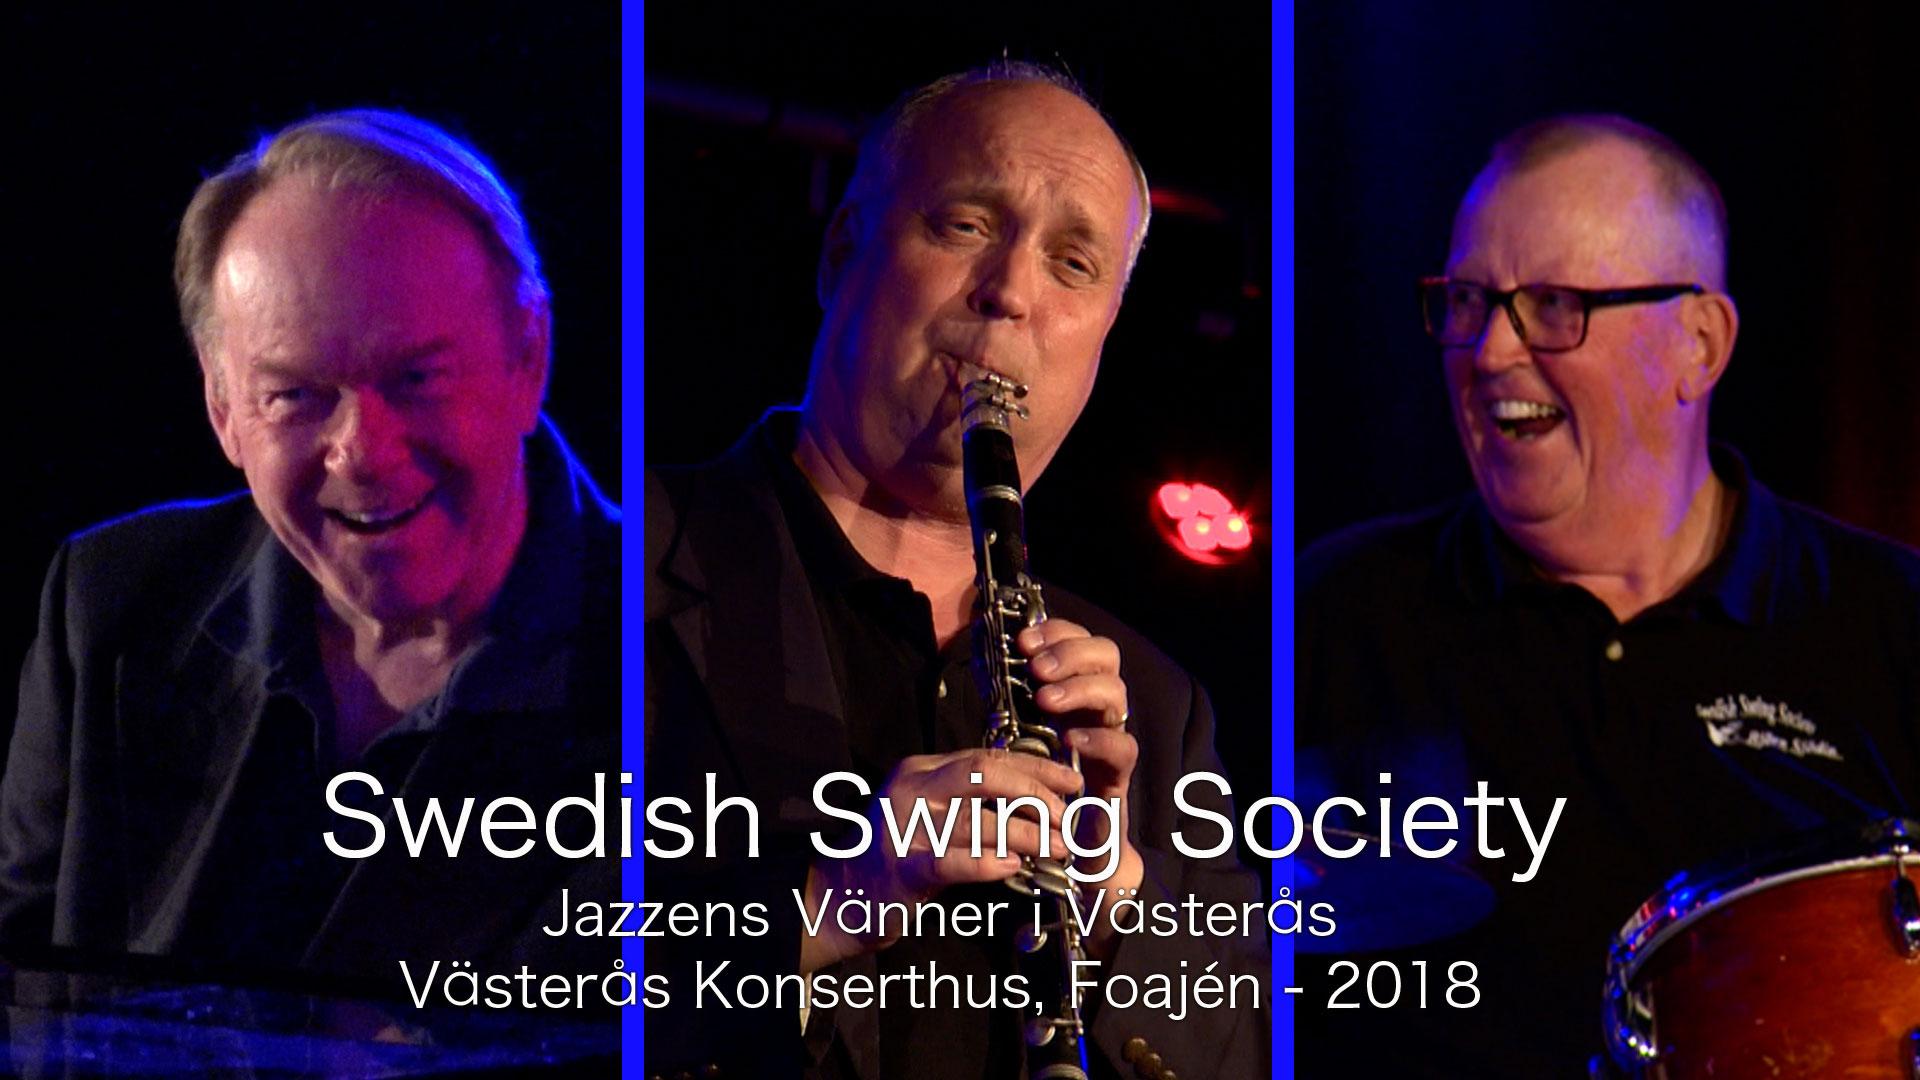 Swedish Swing Society